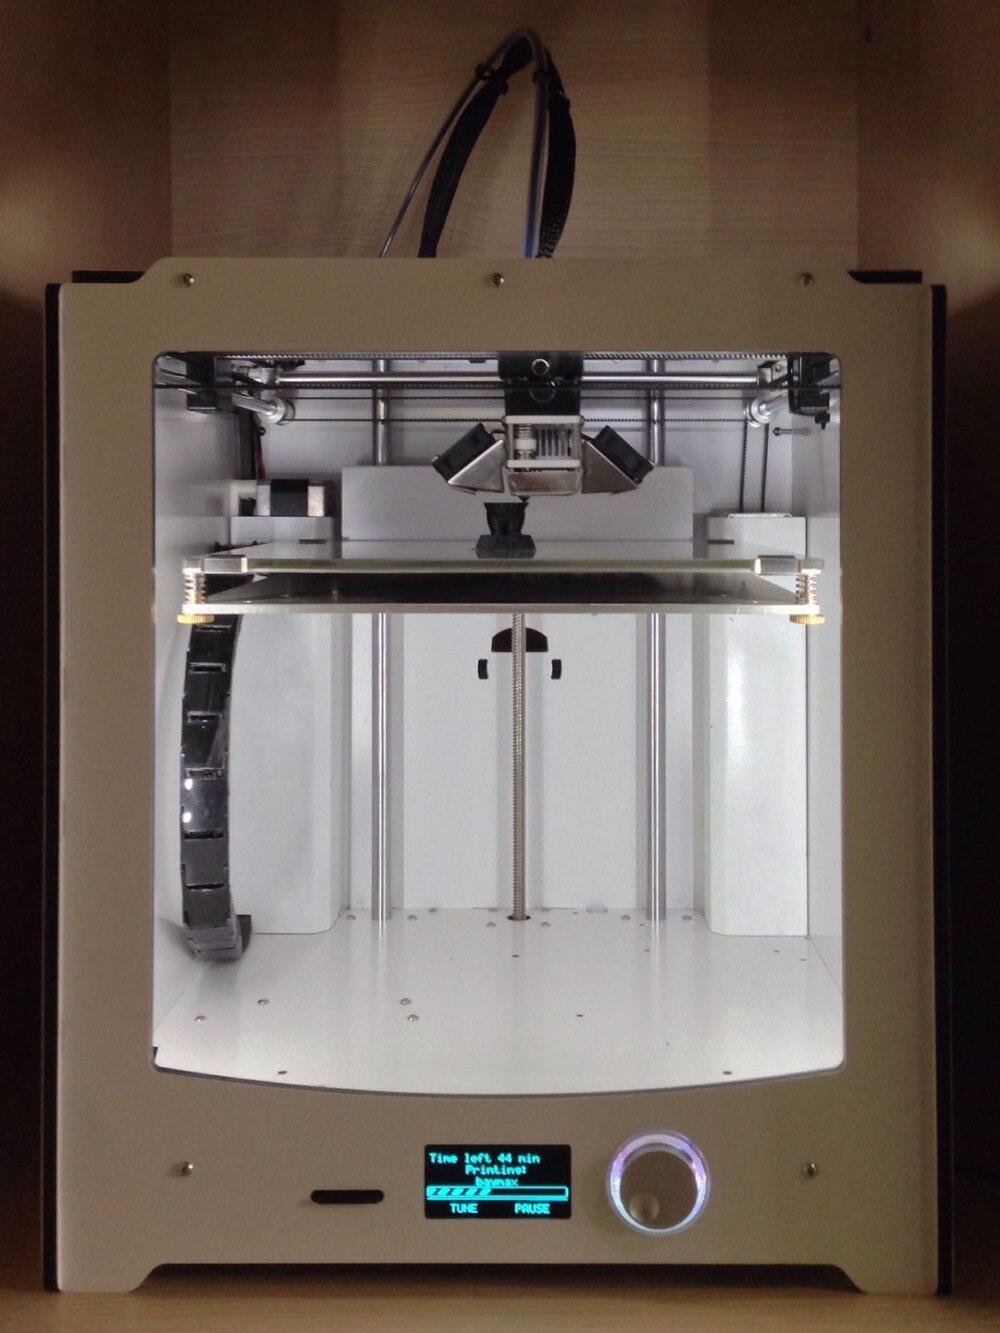 Bricolage UM2 Ultimaker 2 imprimante 3D bricolage kit complet/ensemble (pas assembler) Ultimaker2 singile buses imprimante 3D